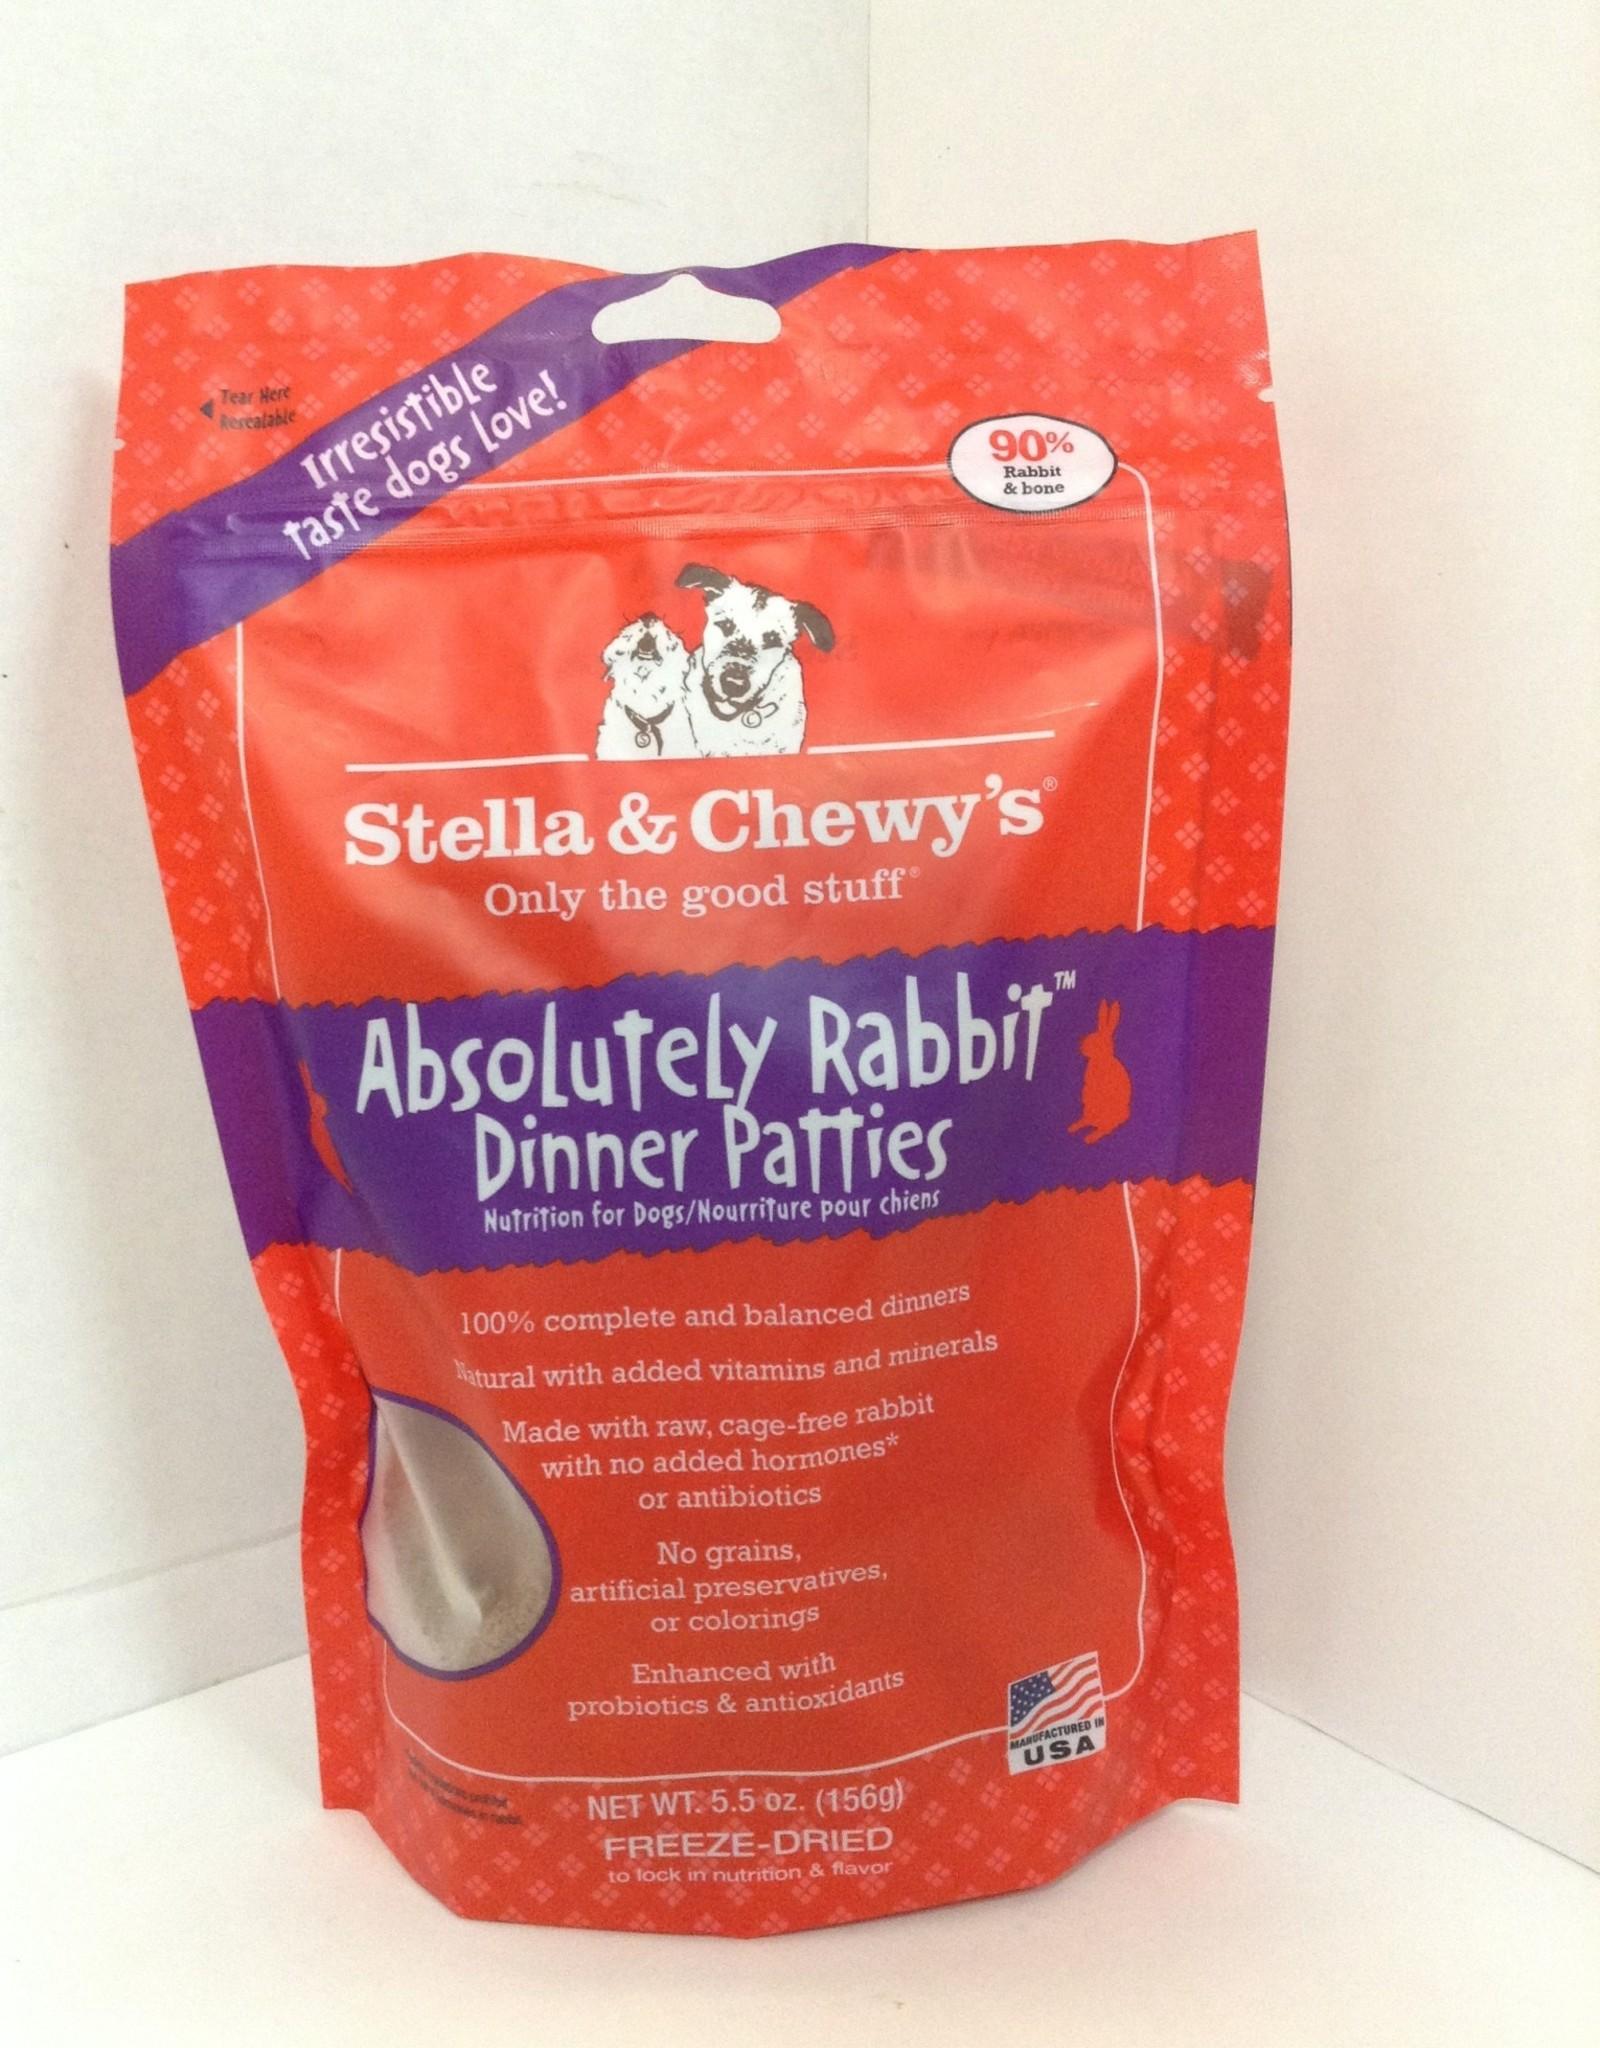 STELLA & CHEWY'S LLC ABSOLUTELY RABBIT FREEZE DRIED PATTIES DOG 5.5OZ STELLA & CHEWY'S